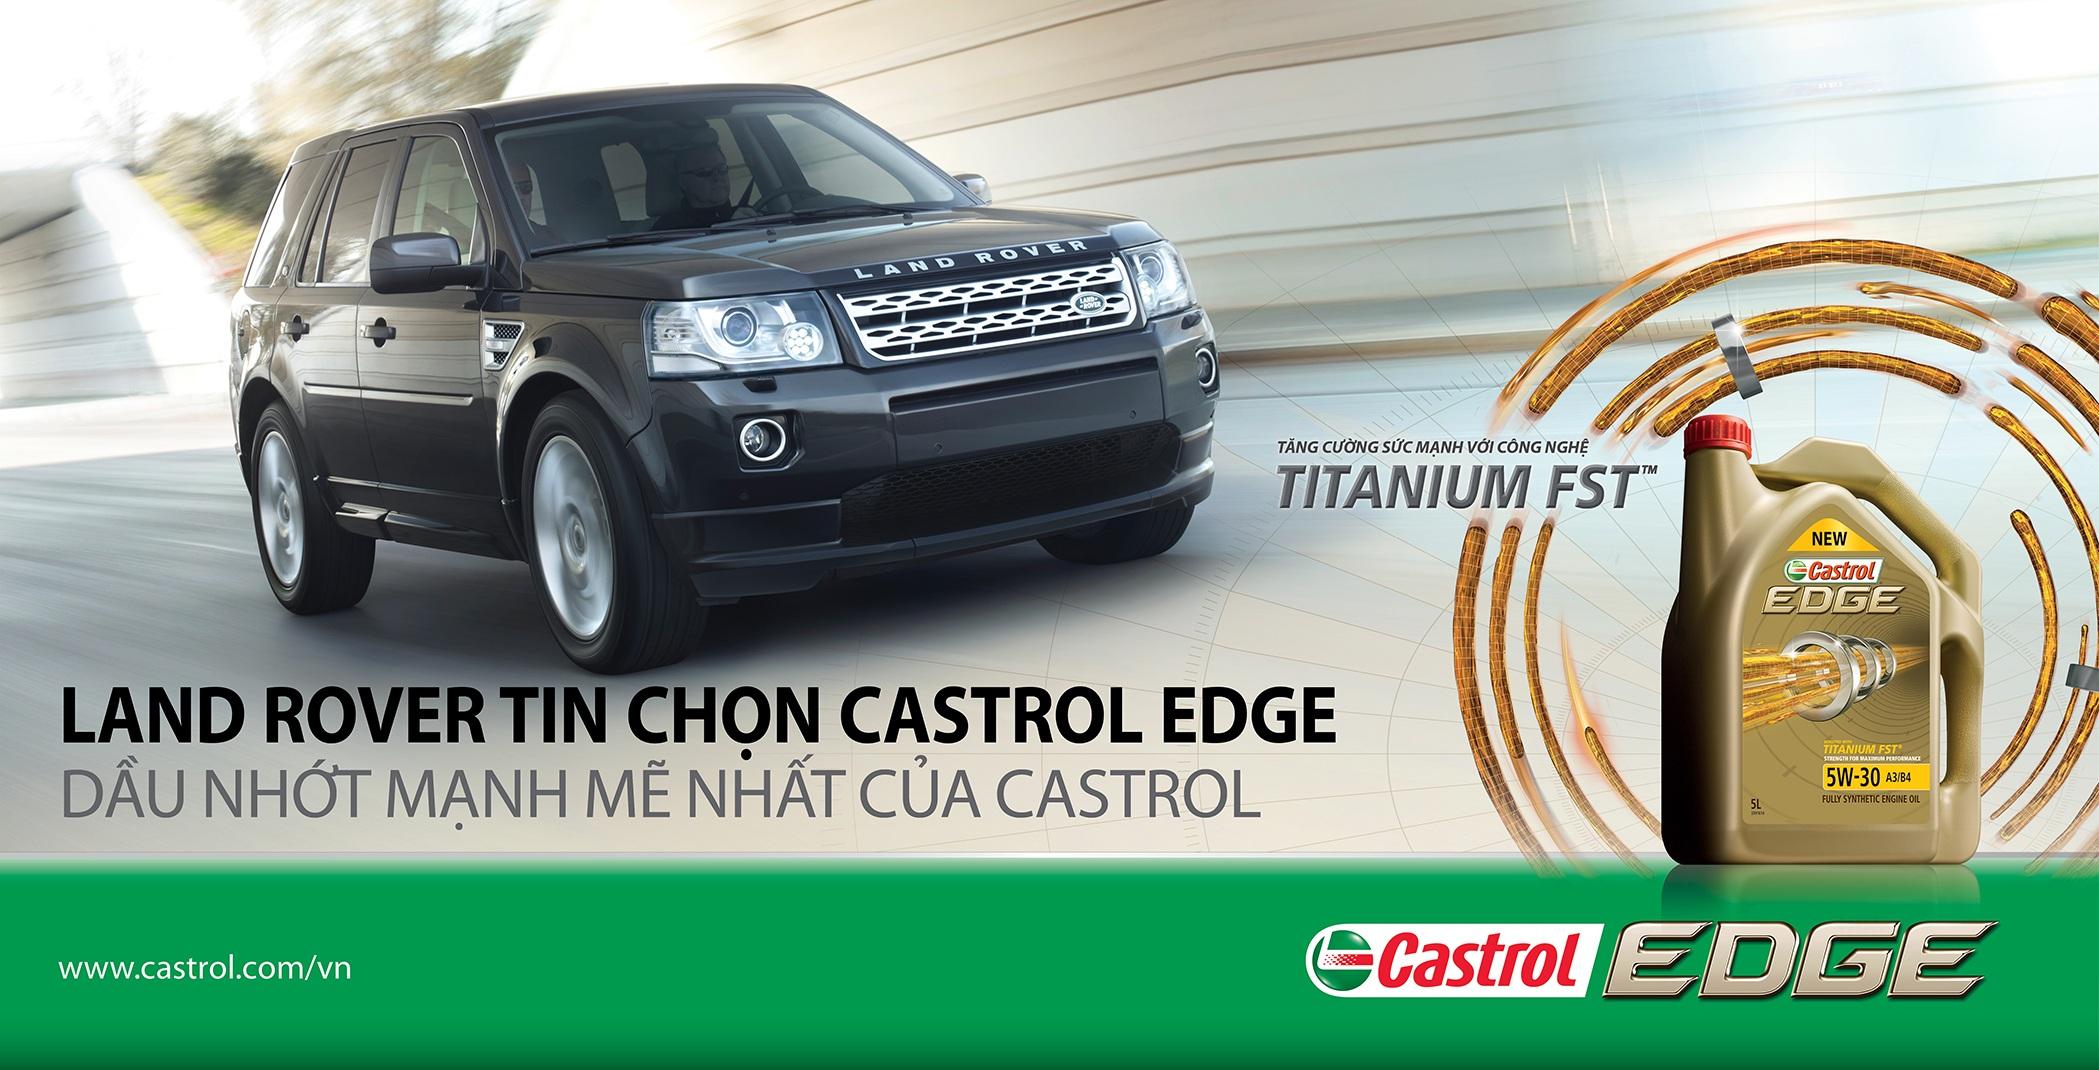 Land Rover tin chọn Castrol EDGE 5W-30